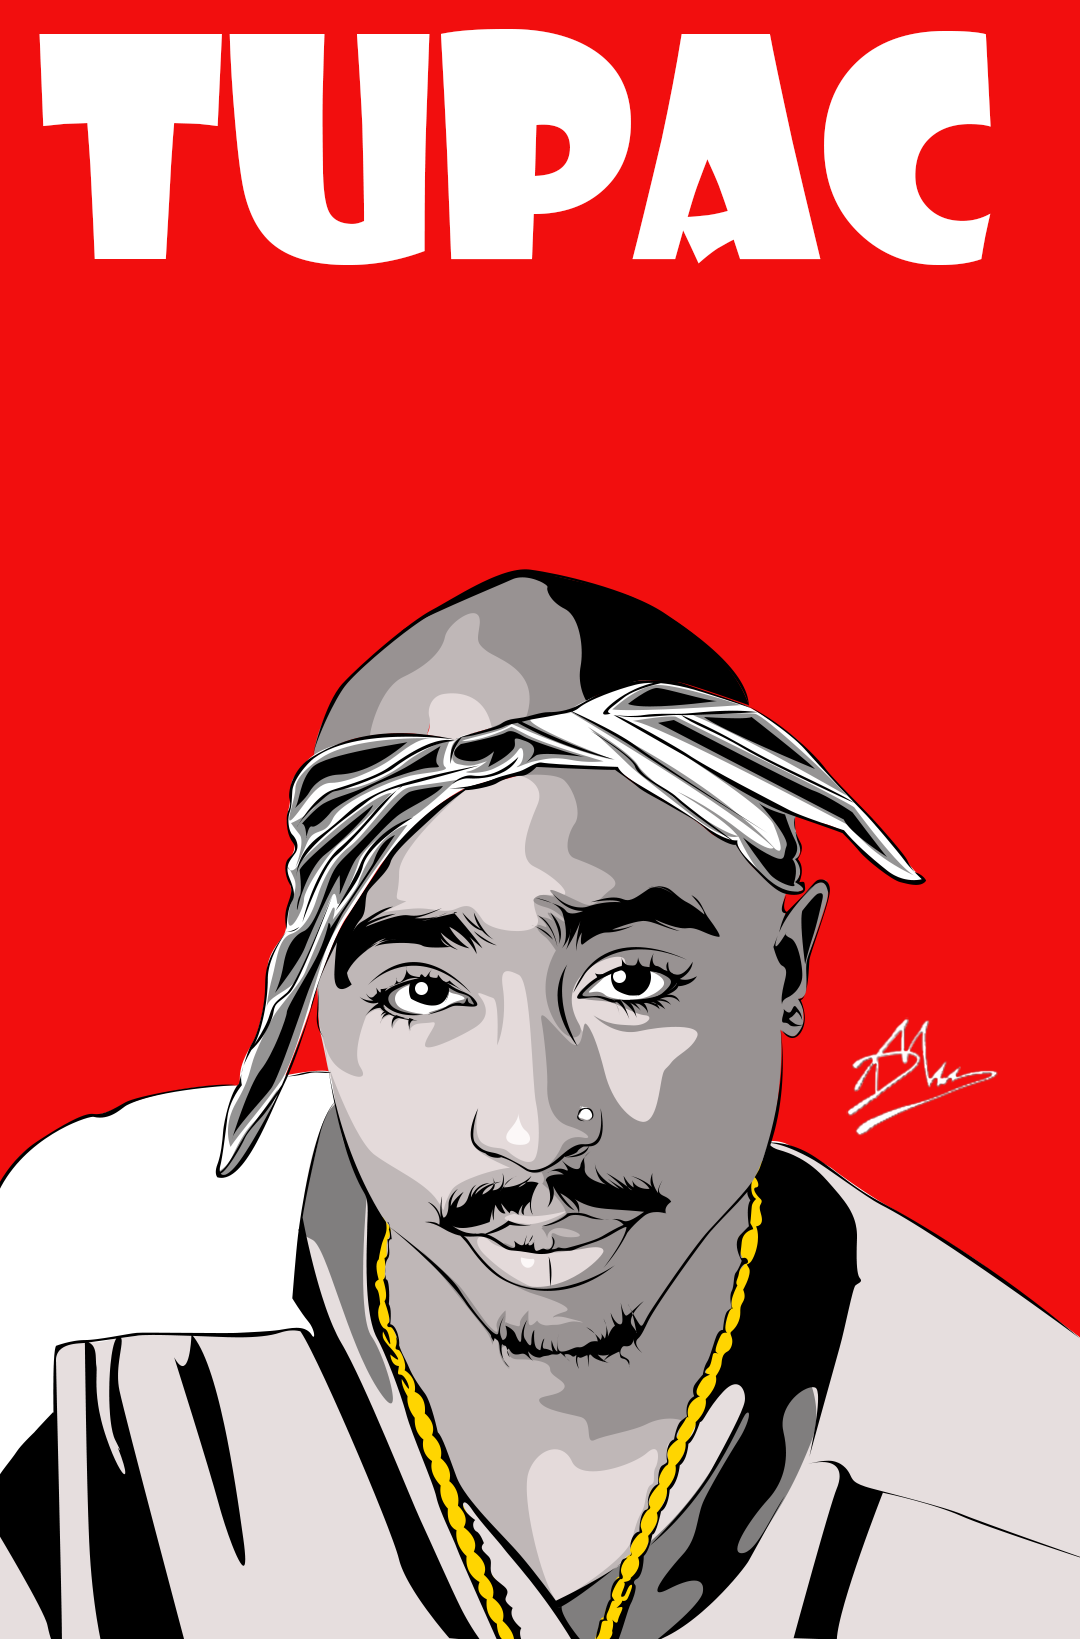 Tupac Thuglife Mama Vectorart Illustration Life Rapper Art Tupac Art Hip Hop Artwork